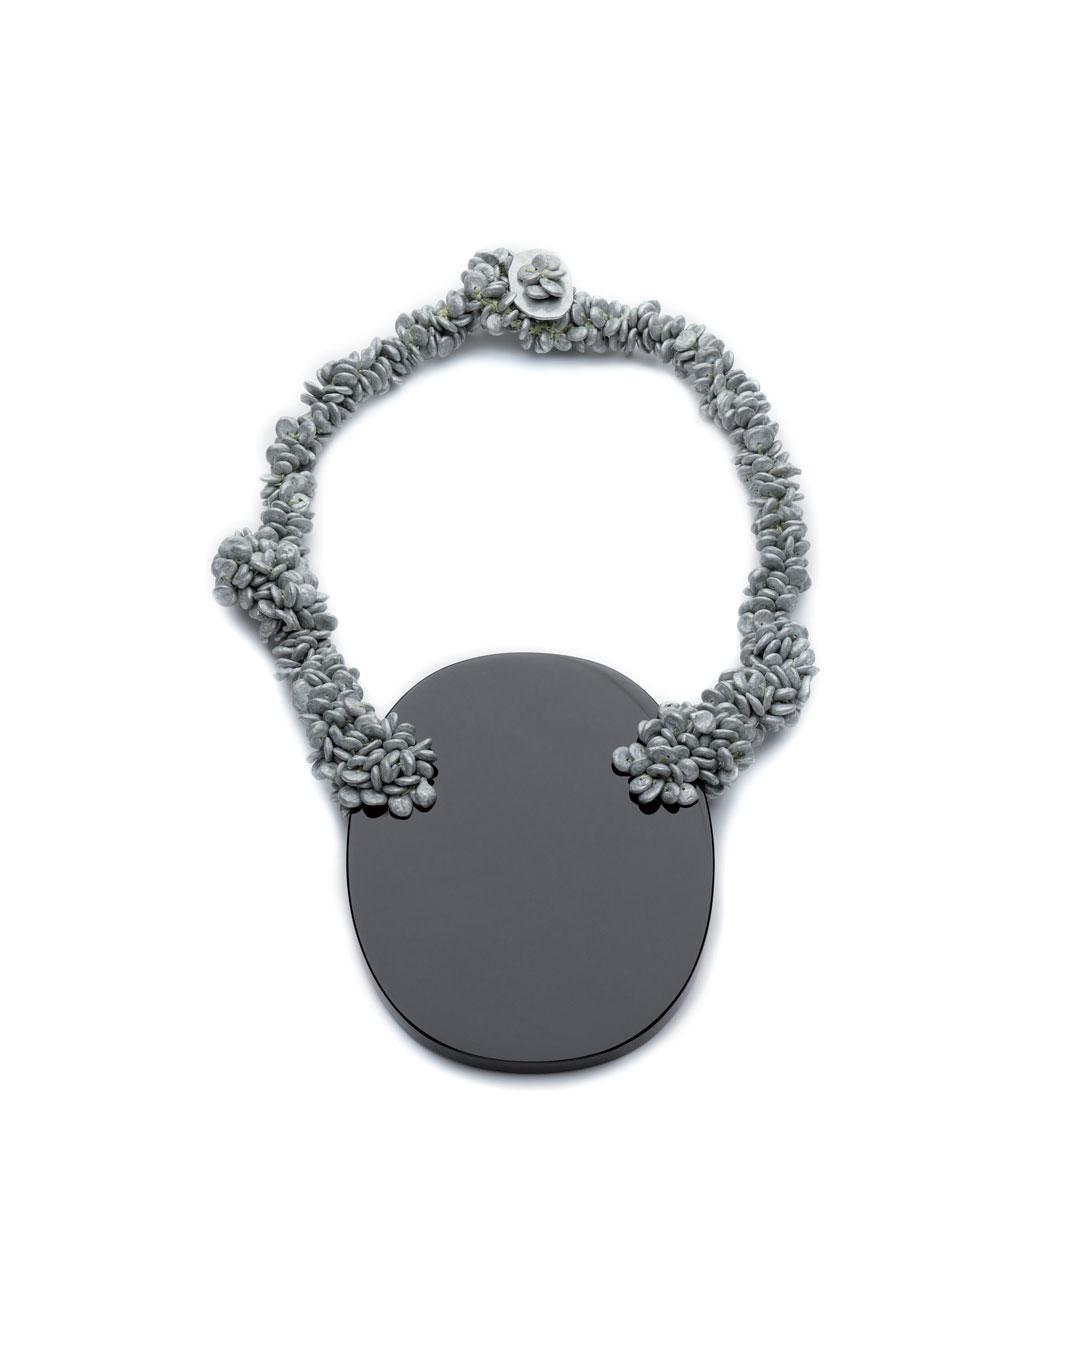 Iris Bodemer, untitled, 2008, necklace; obsidian, zinc, fishing wire, 260 x 170 x 25 mm, €3500